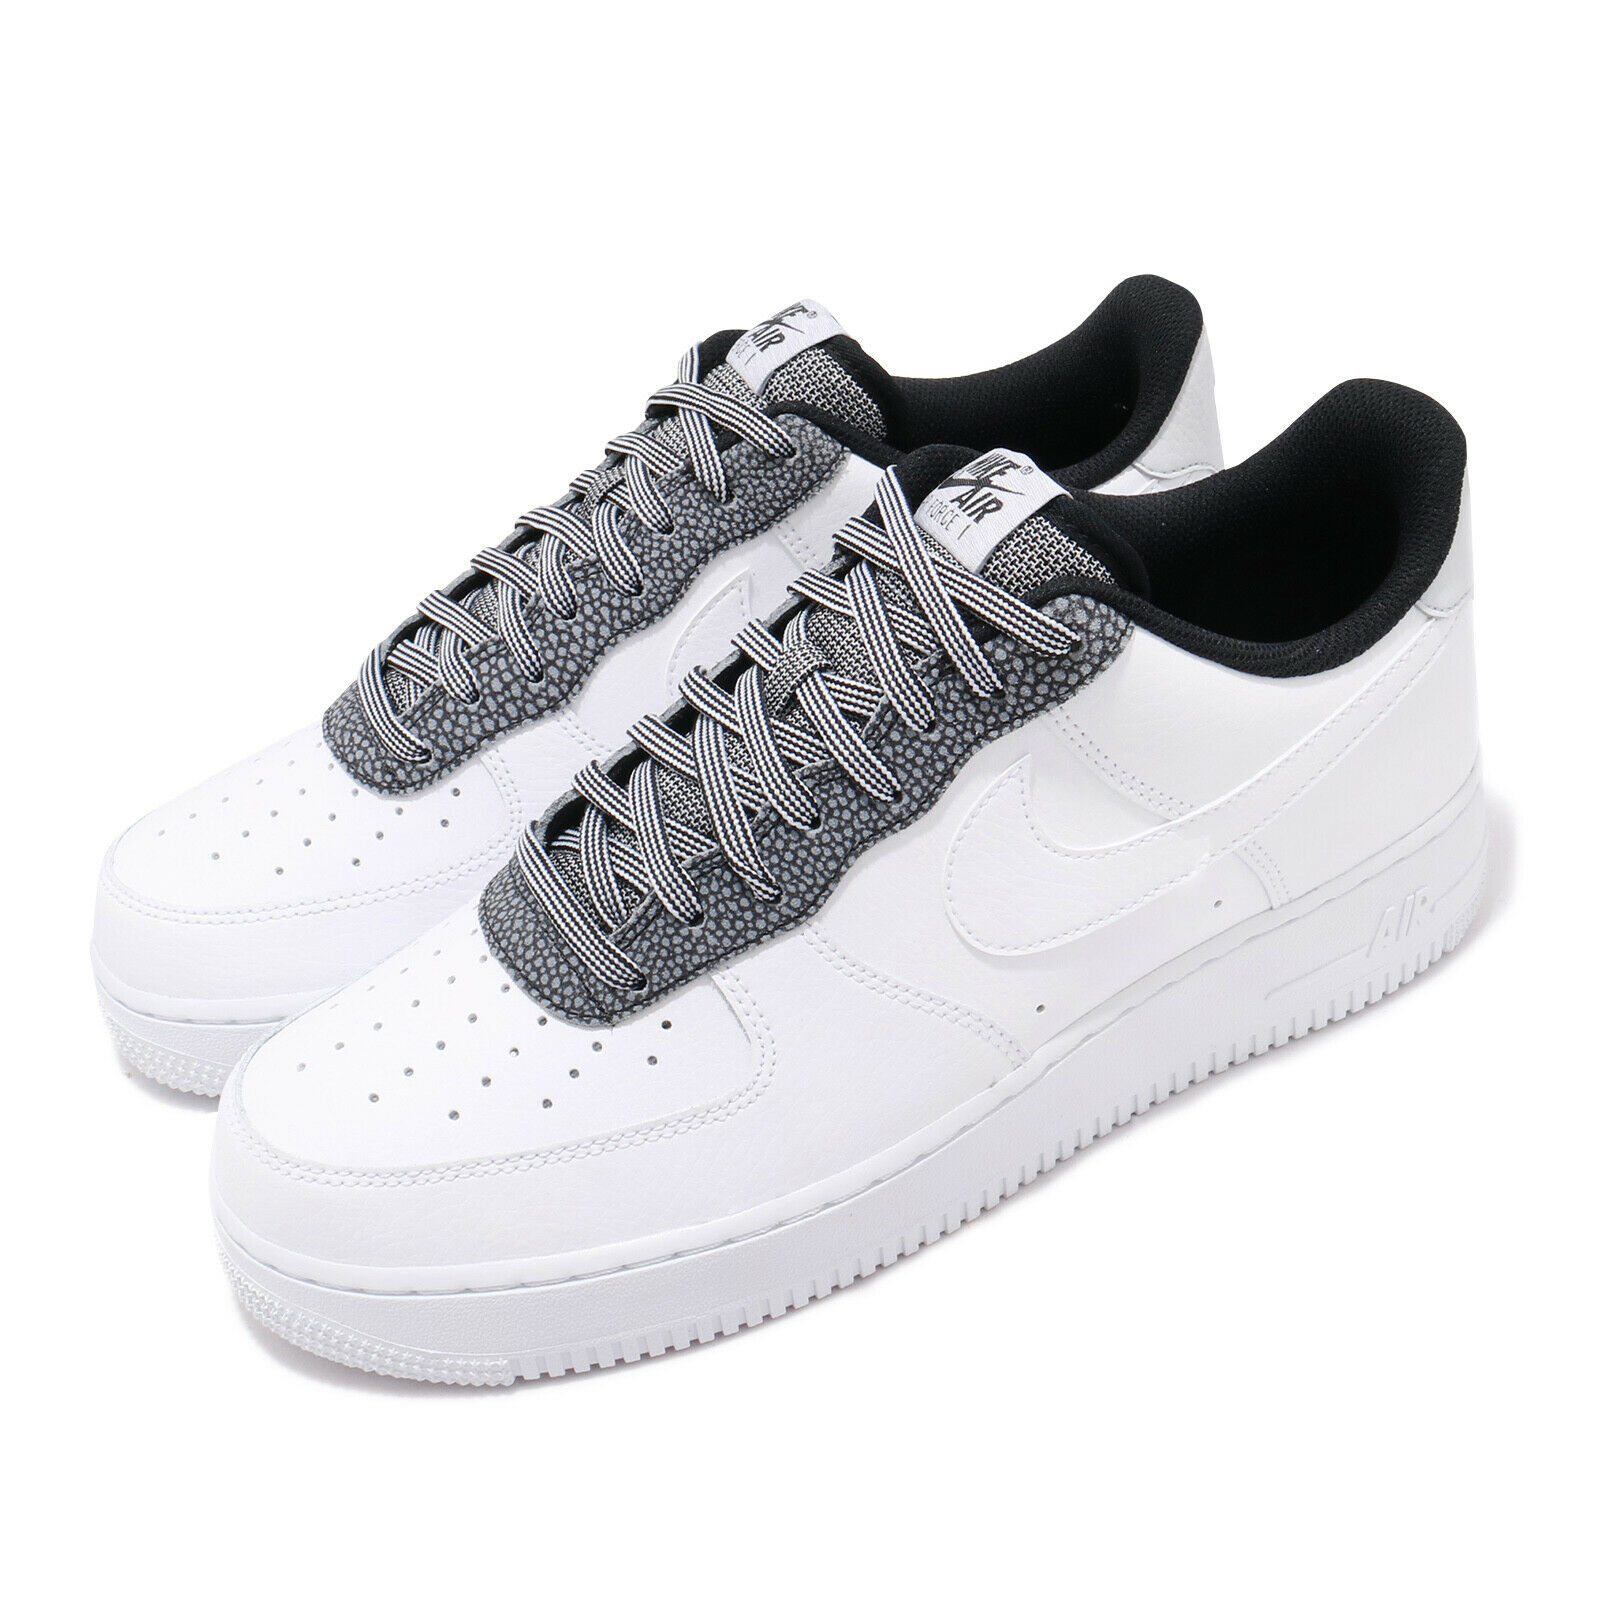 Nike Air Force 1 07 Lv8 4 BlackBlack